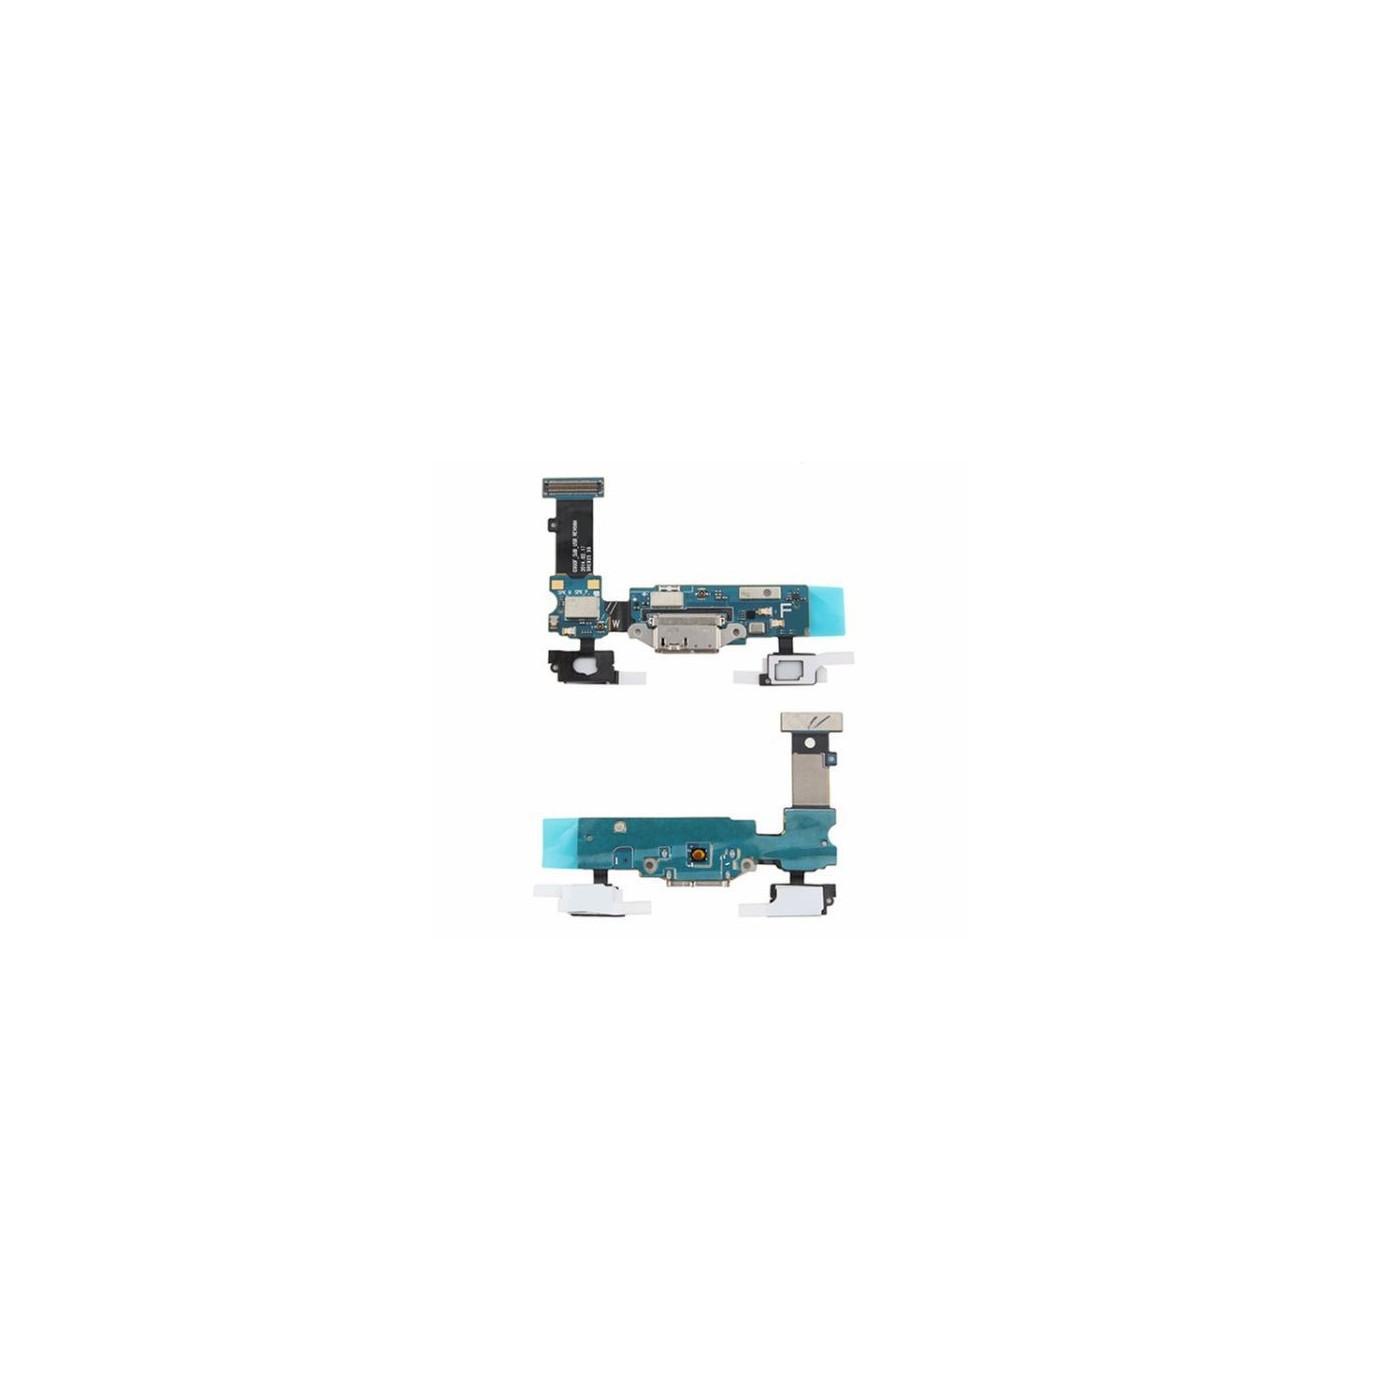 Flat flex plug carica dati originale per samsung galaxy s5 sm-g900 micro usb sensore tasti